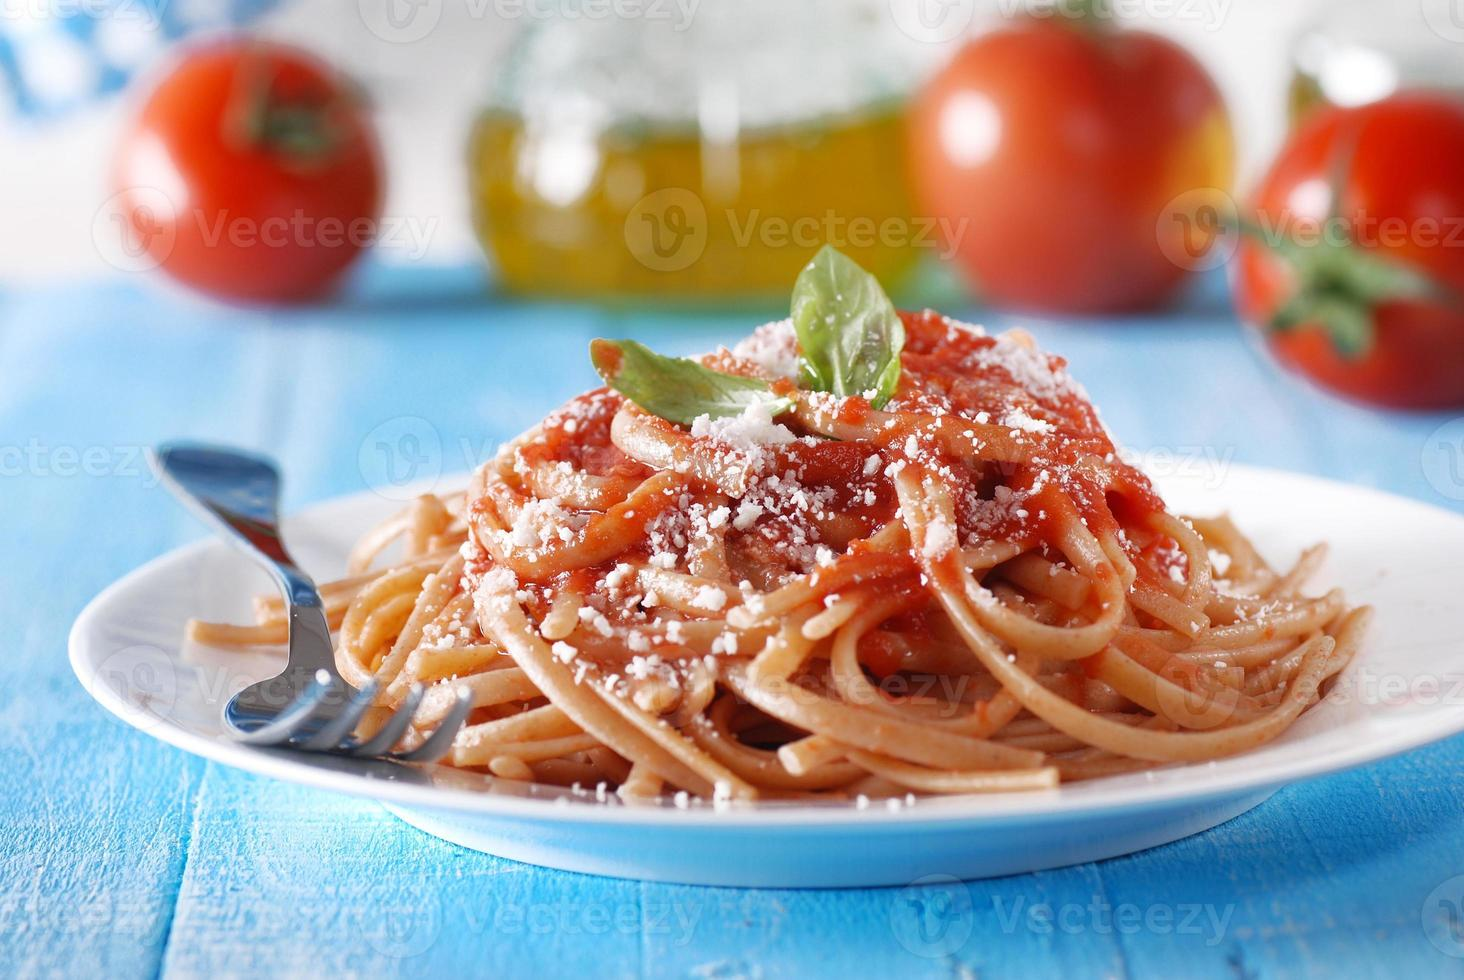 Espagueti con salsa de tomate foto